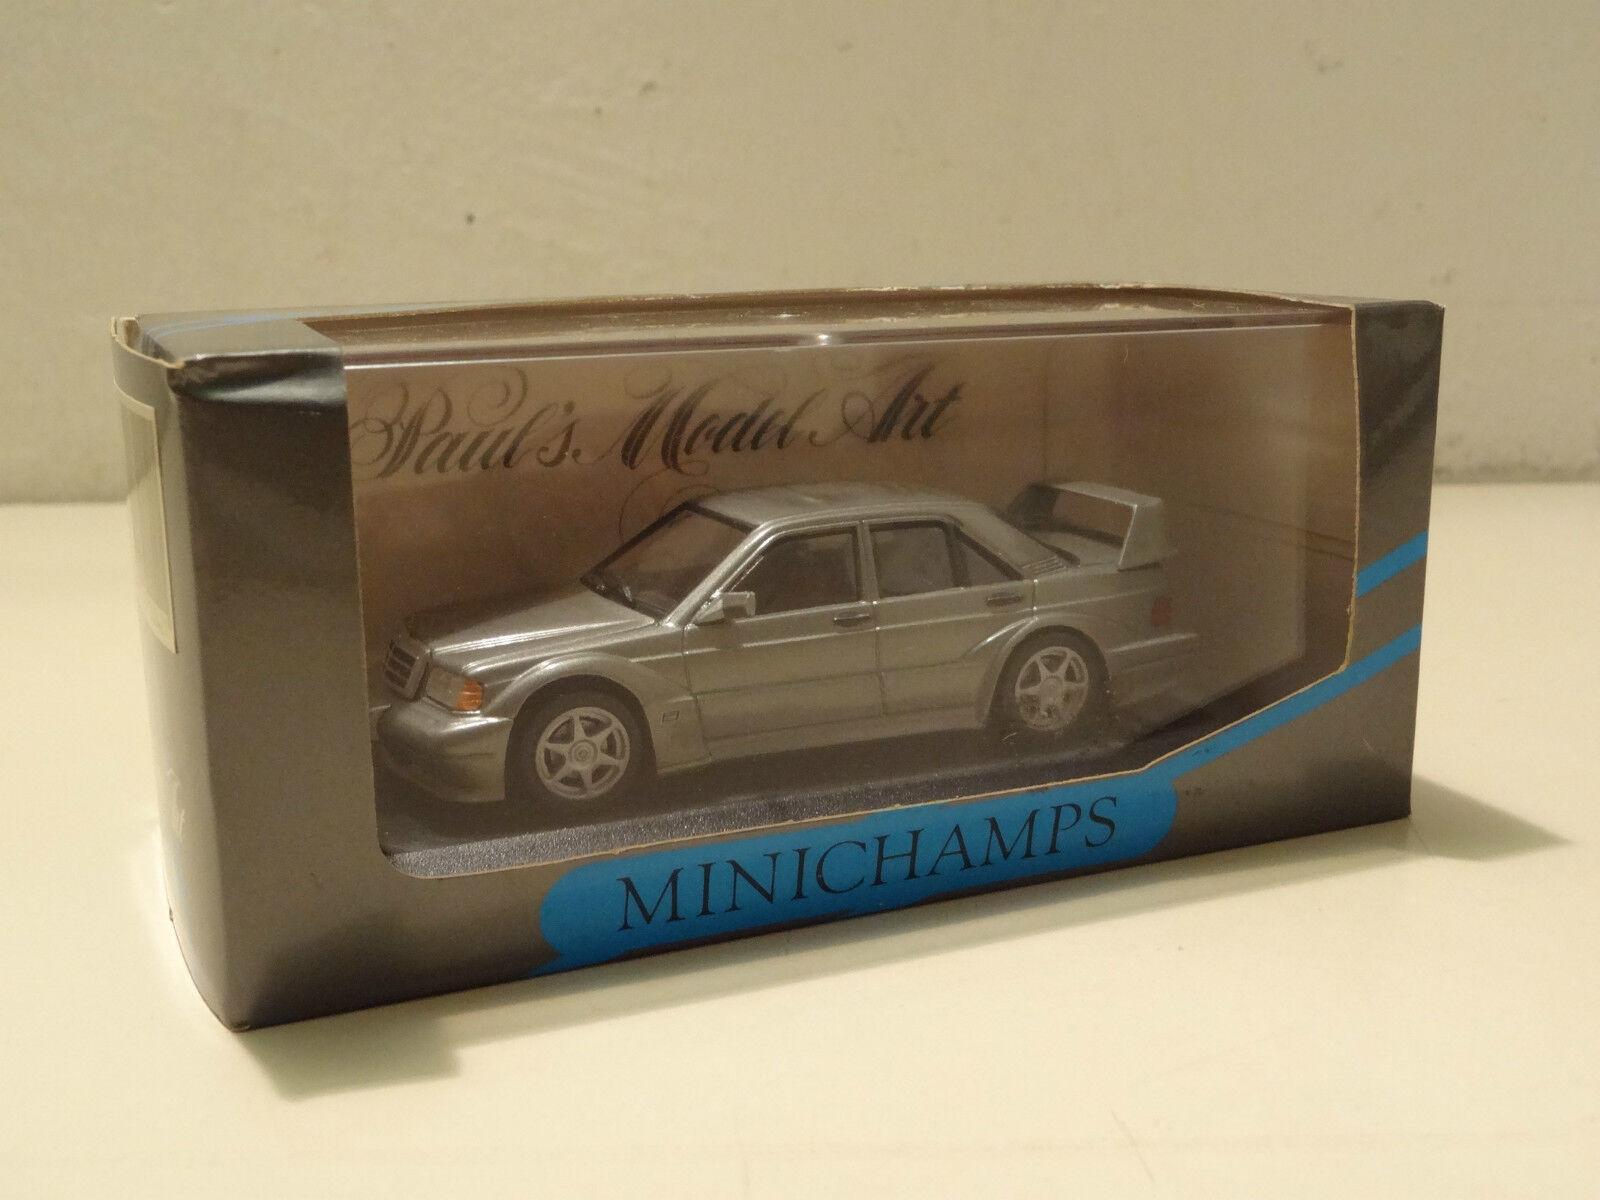 Mercedes-Benz 190 e Evo 2 Street Pearl Grigio Met Minichamps 1:43